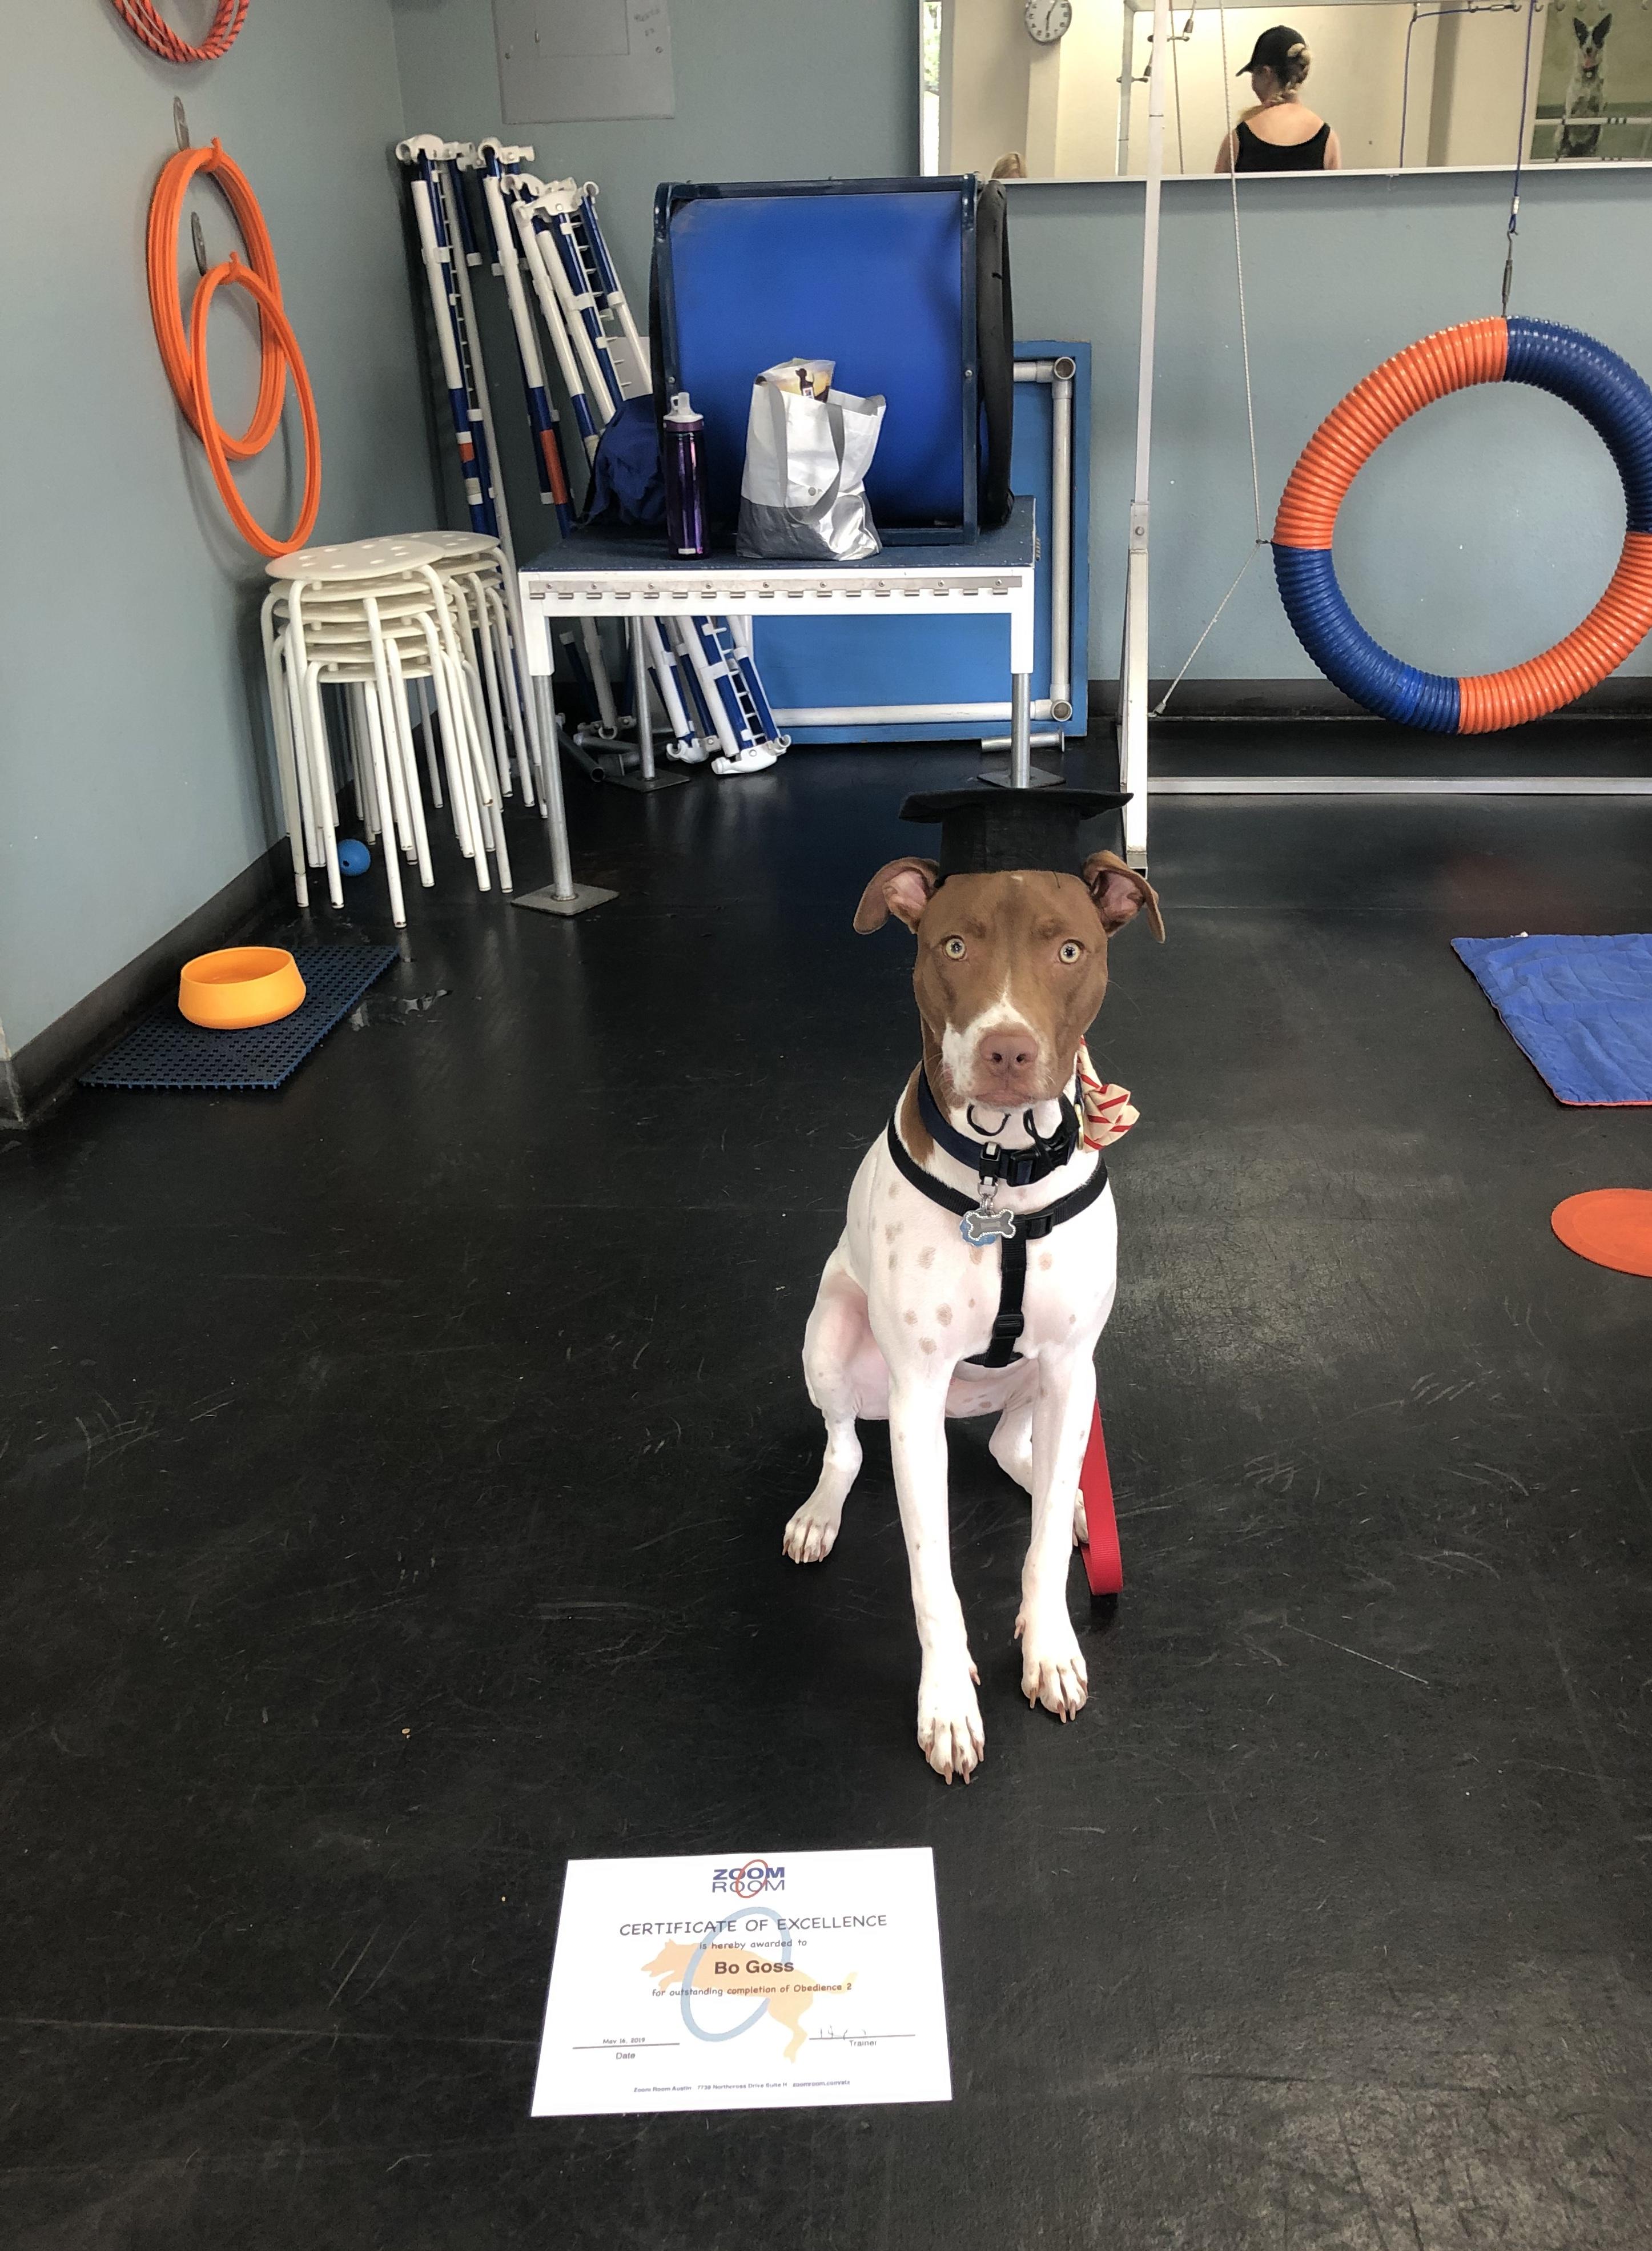 Dog training austin agility obedience puppy zoom room dog